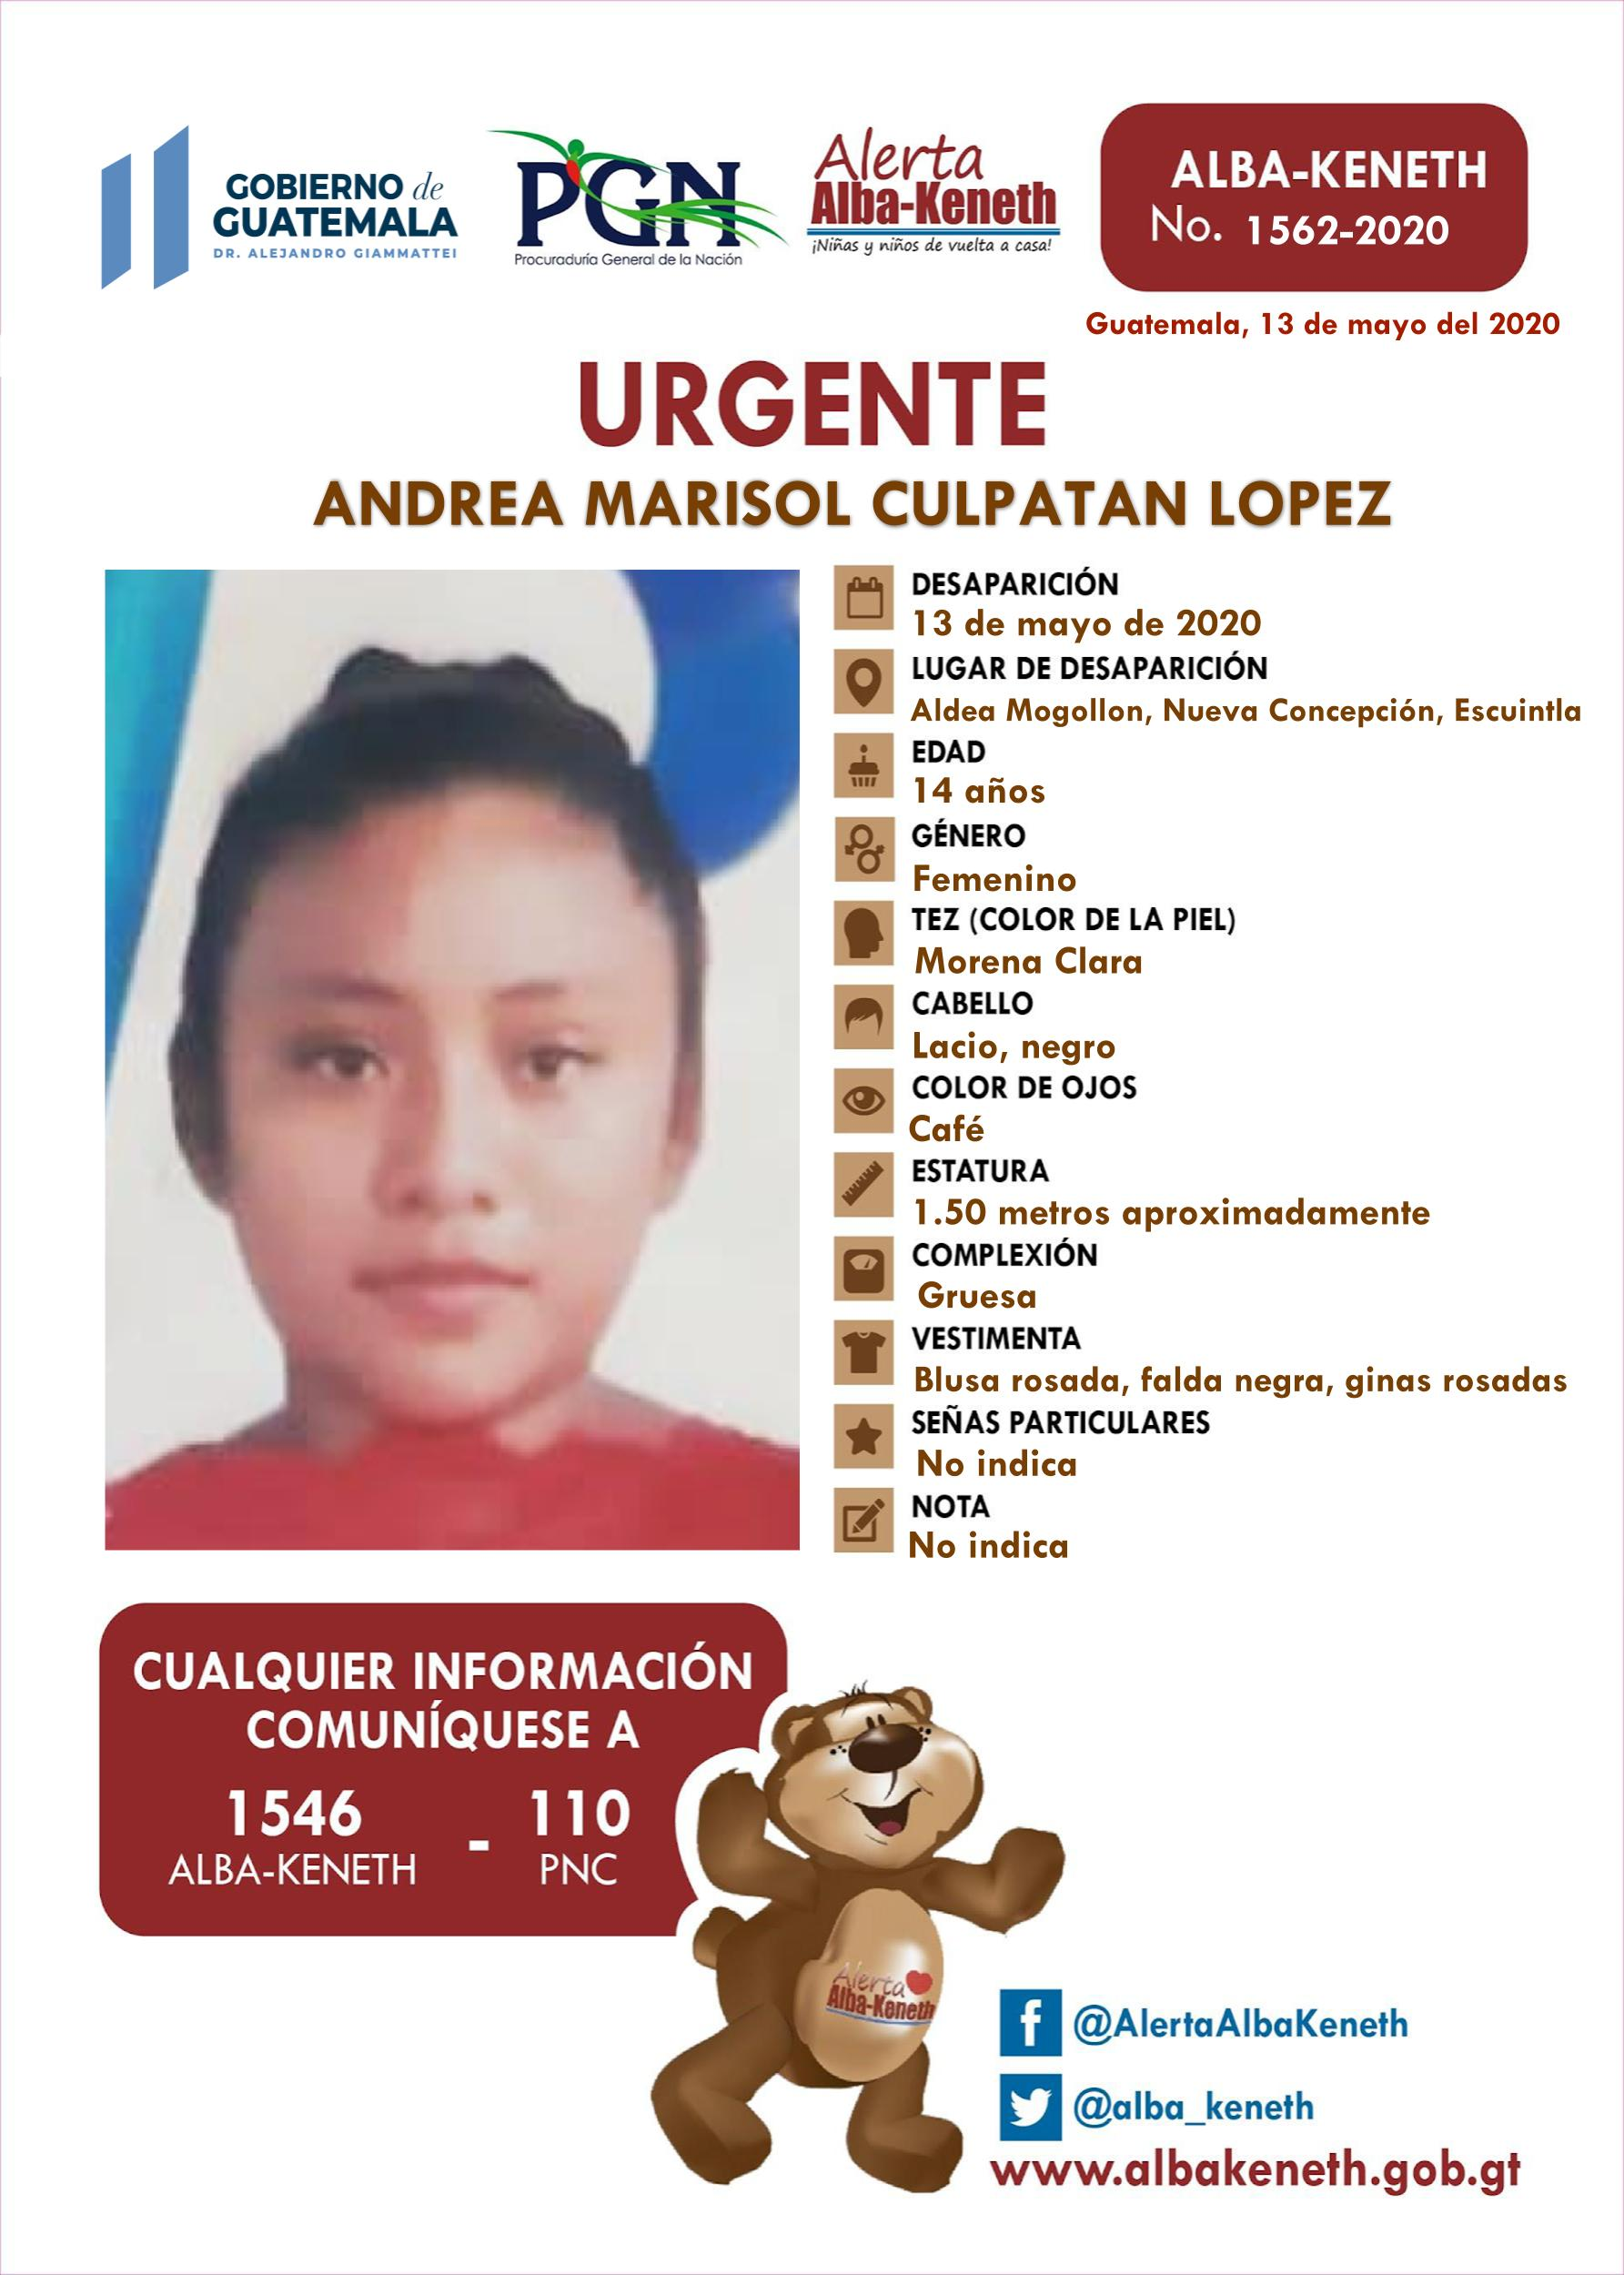 Andrea Marisol Culpatan Lopez